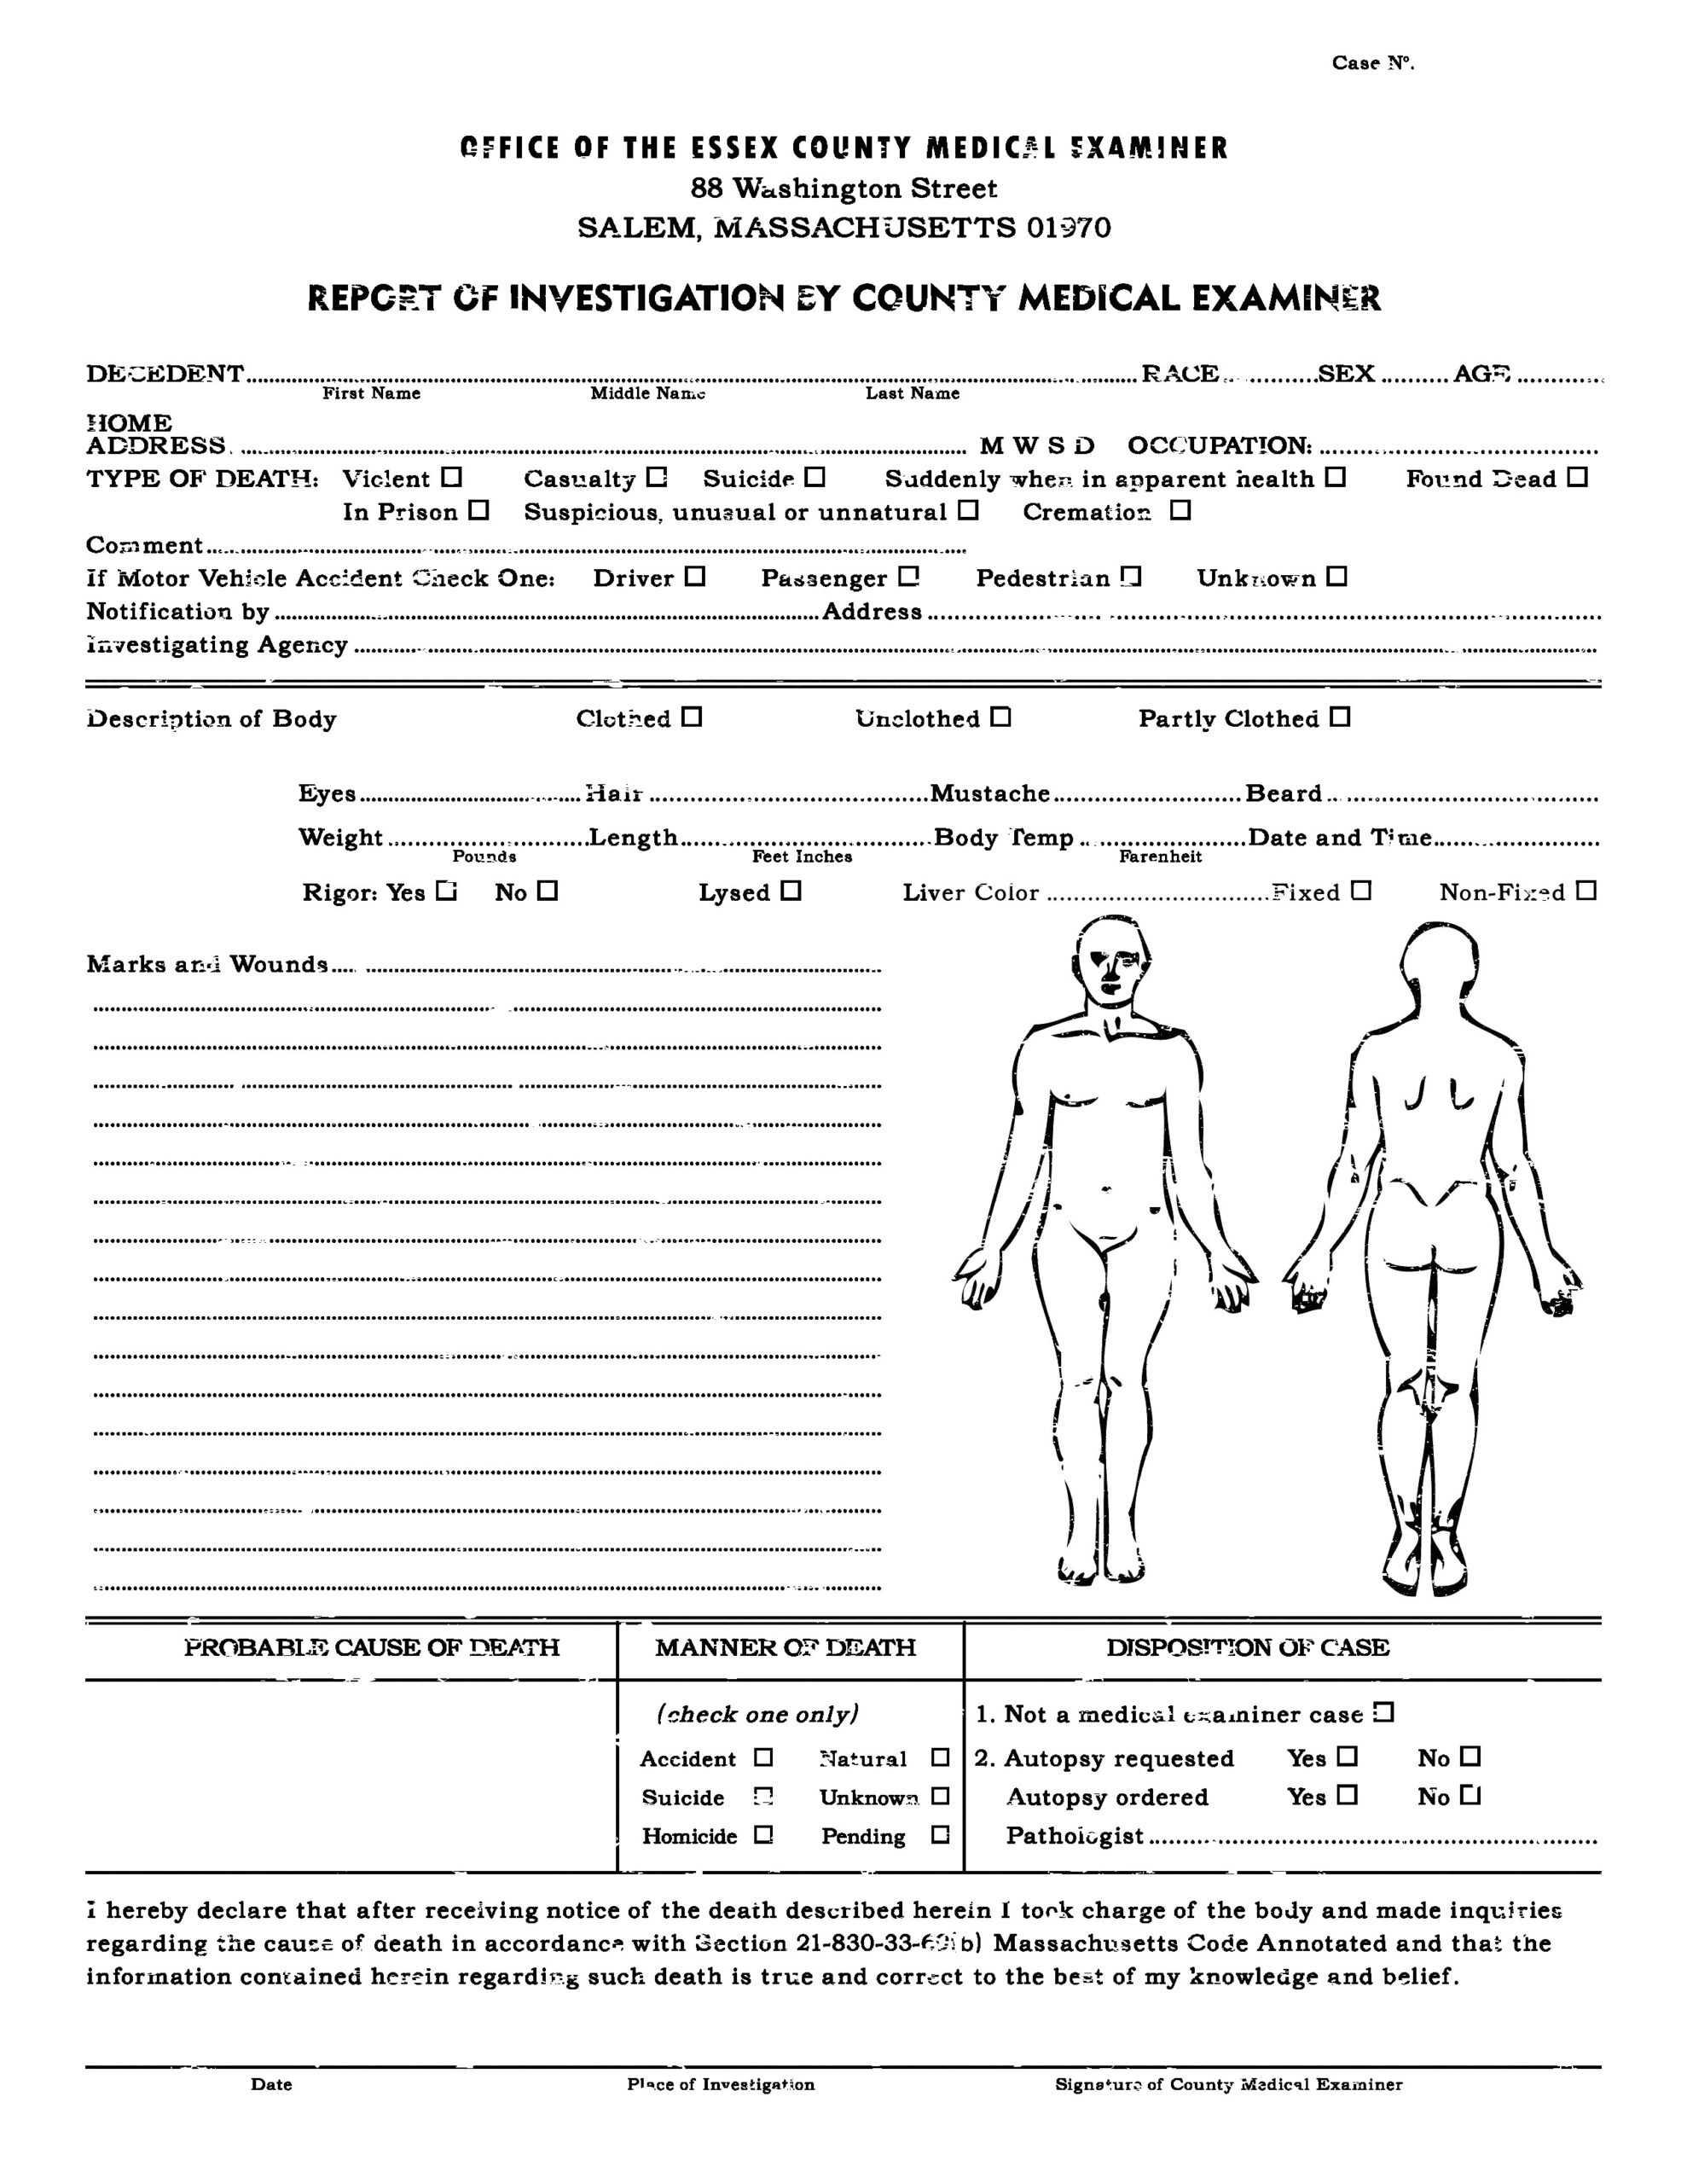 Autopsy Report Template - Atlantaauctionco Inside Autopsy Report Template